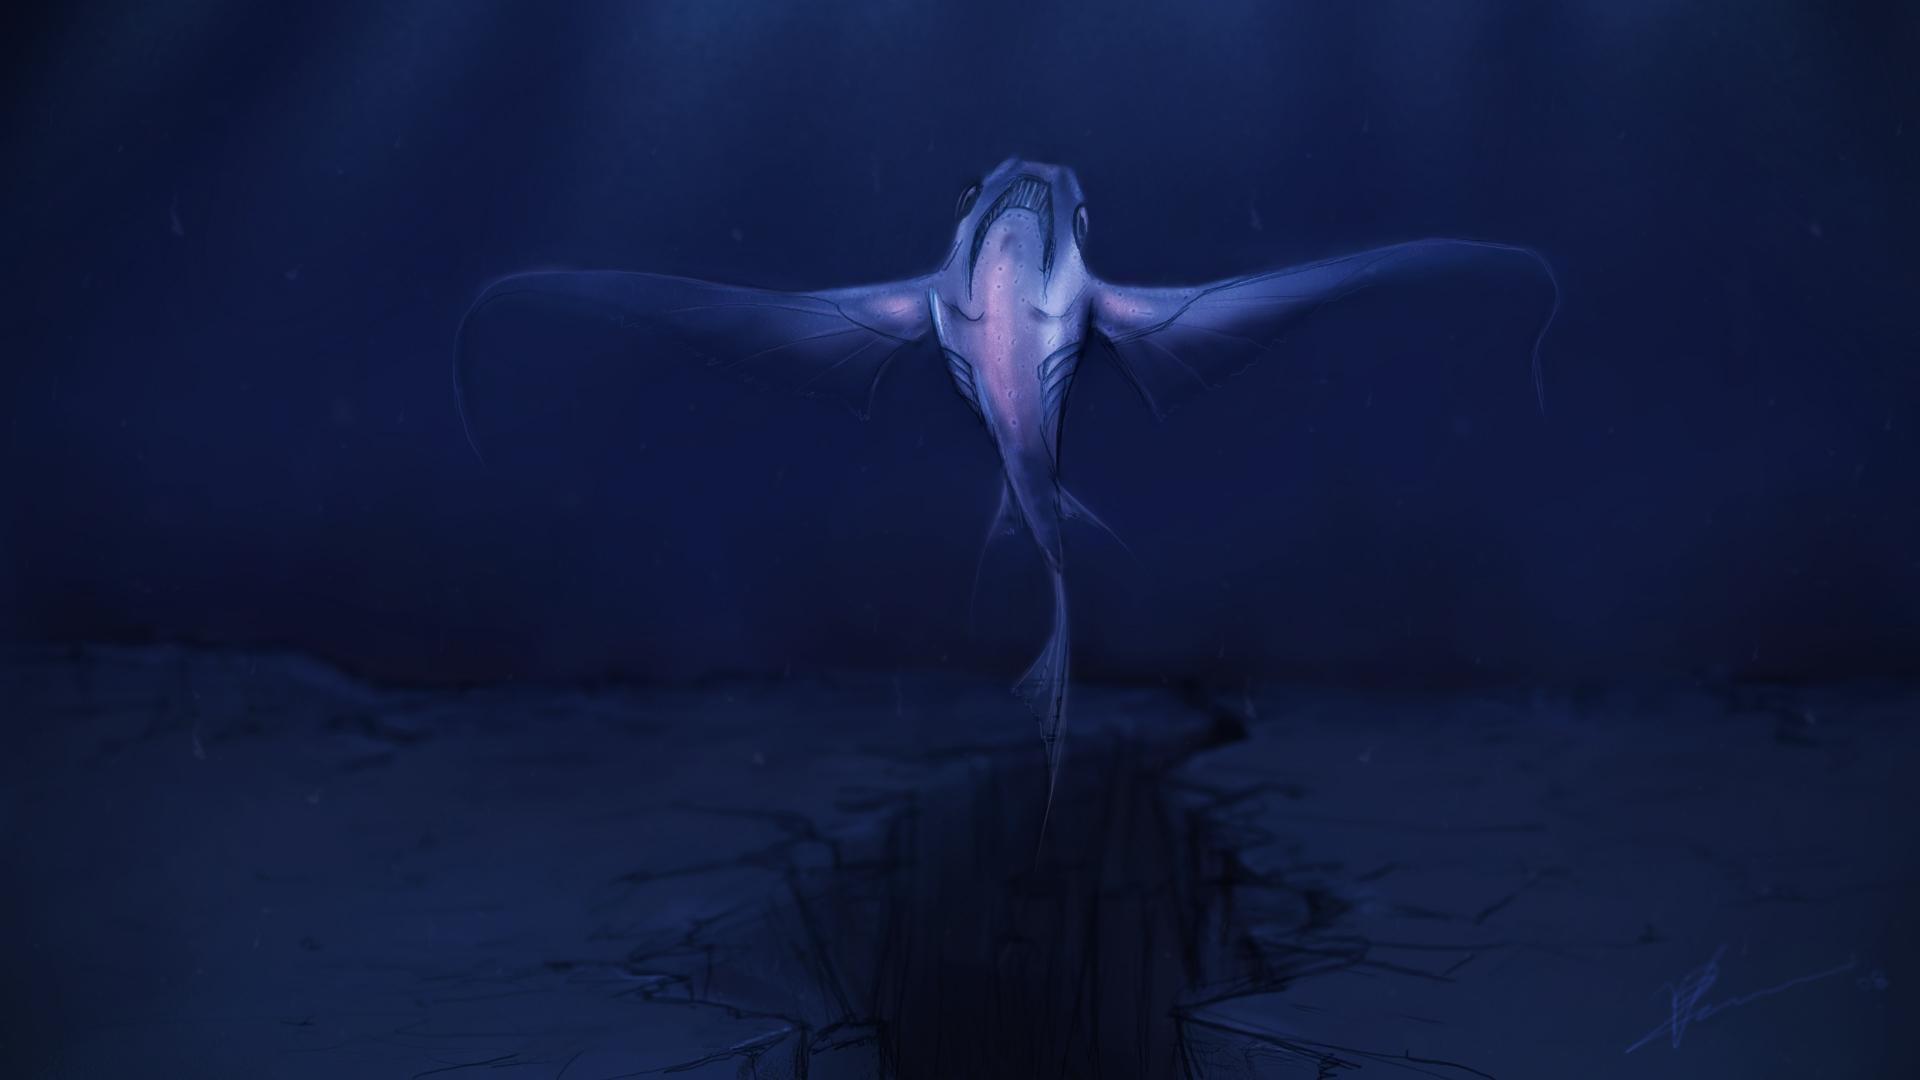 deep blue sea   wallpaper deep blue sea   wallpapers deep blue sea 1920x1080